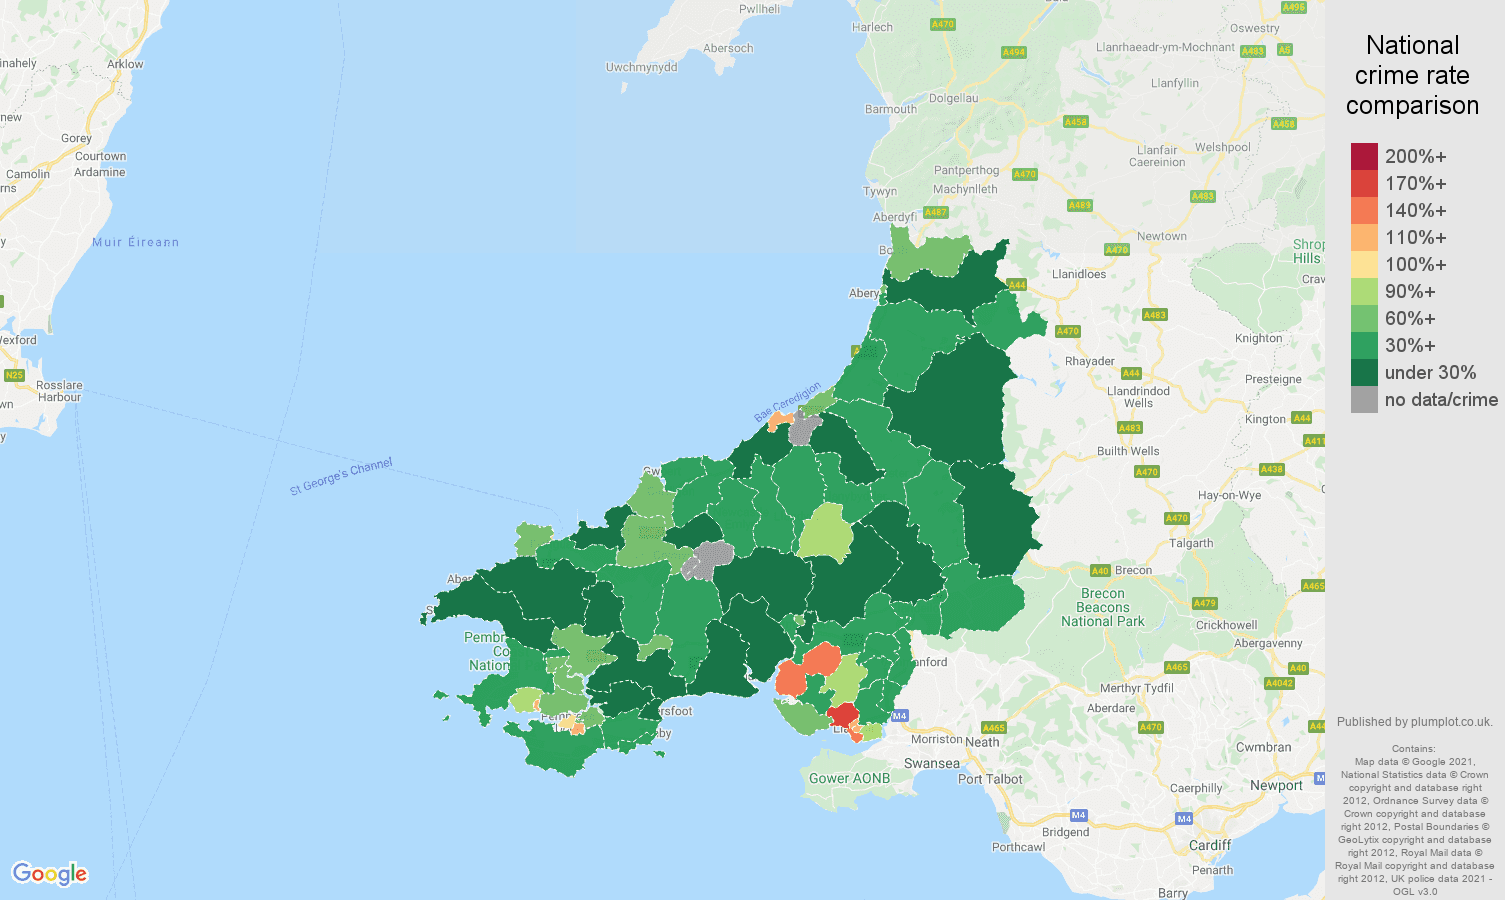 Dyfed burglary crime rate comparison map